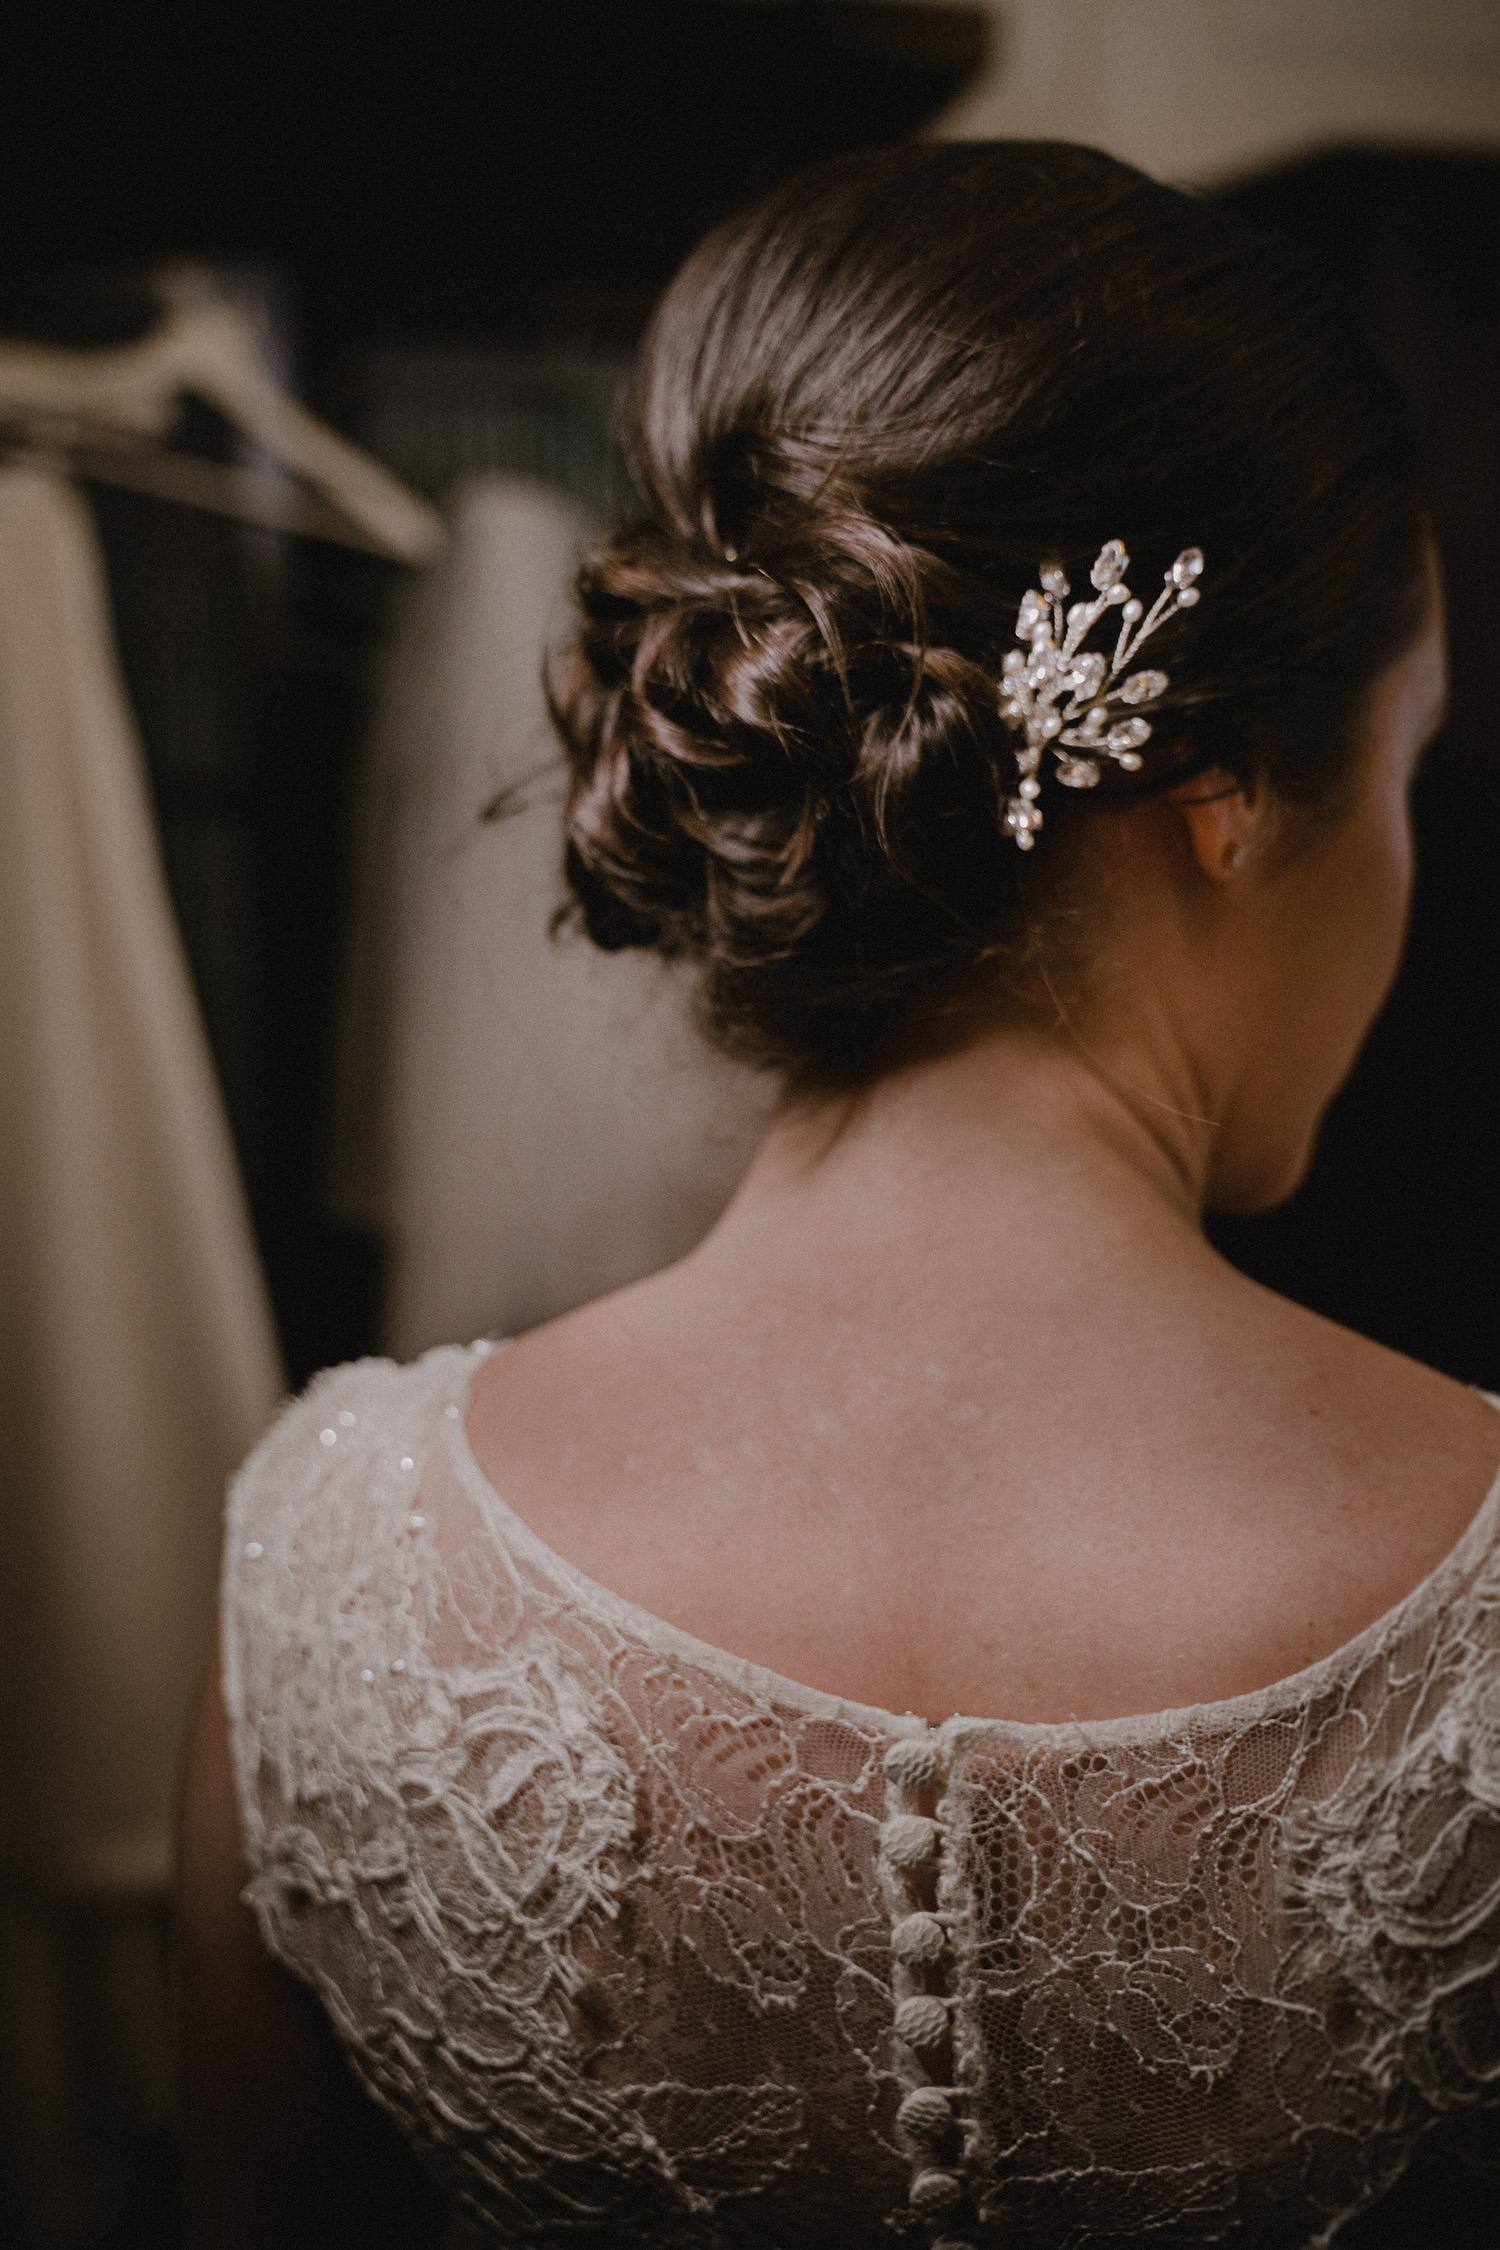 Mansion-House-London-Wedding-Photos-15.jpg